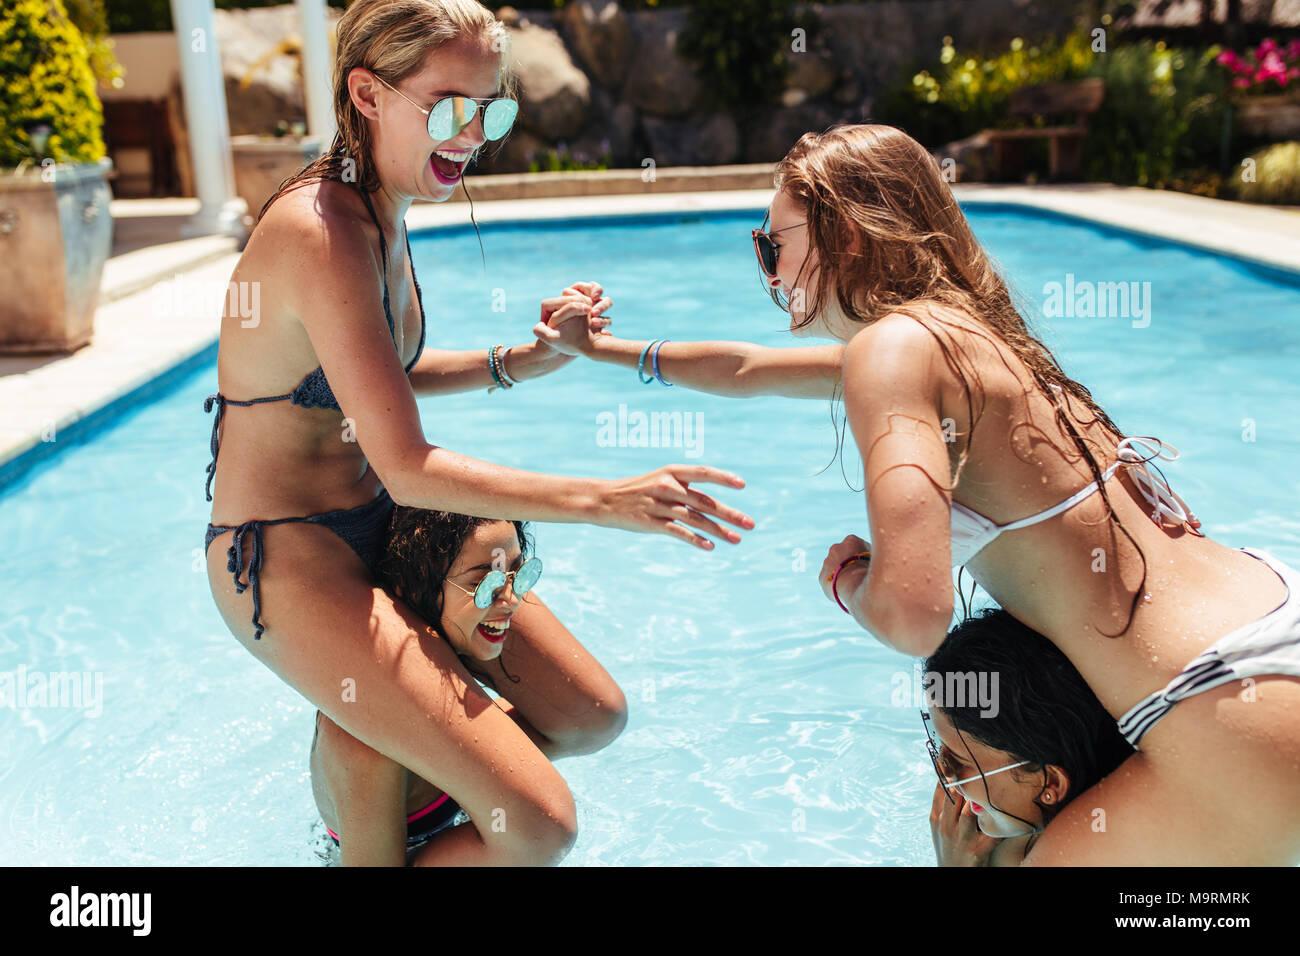 Words... super, bikini fight girl matchless